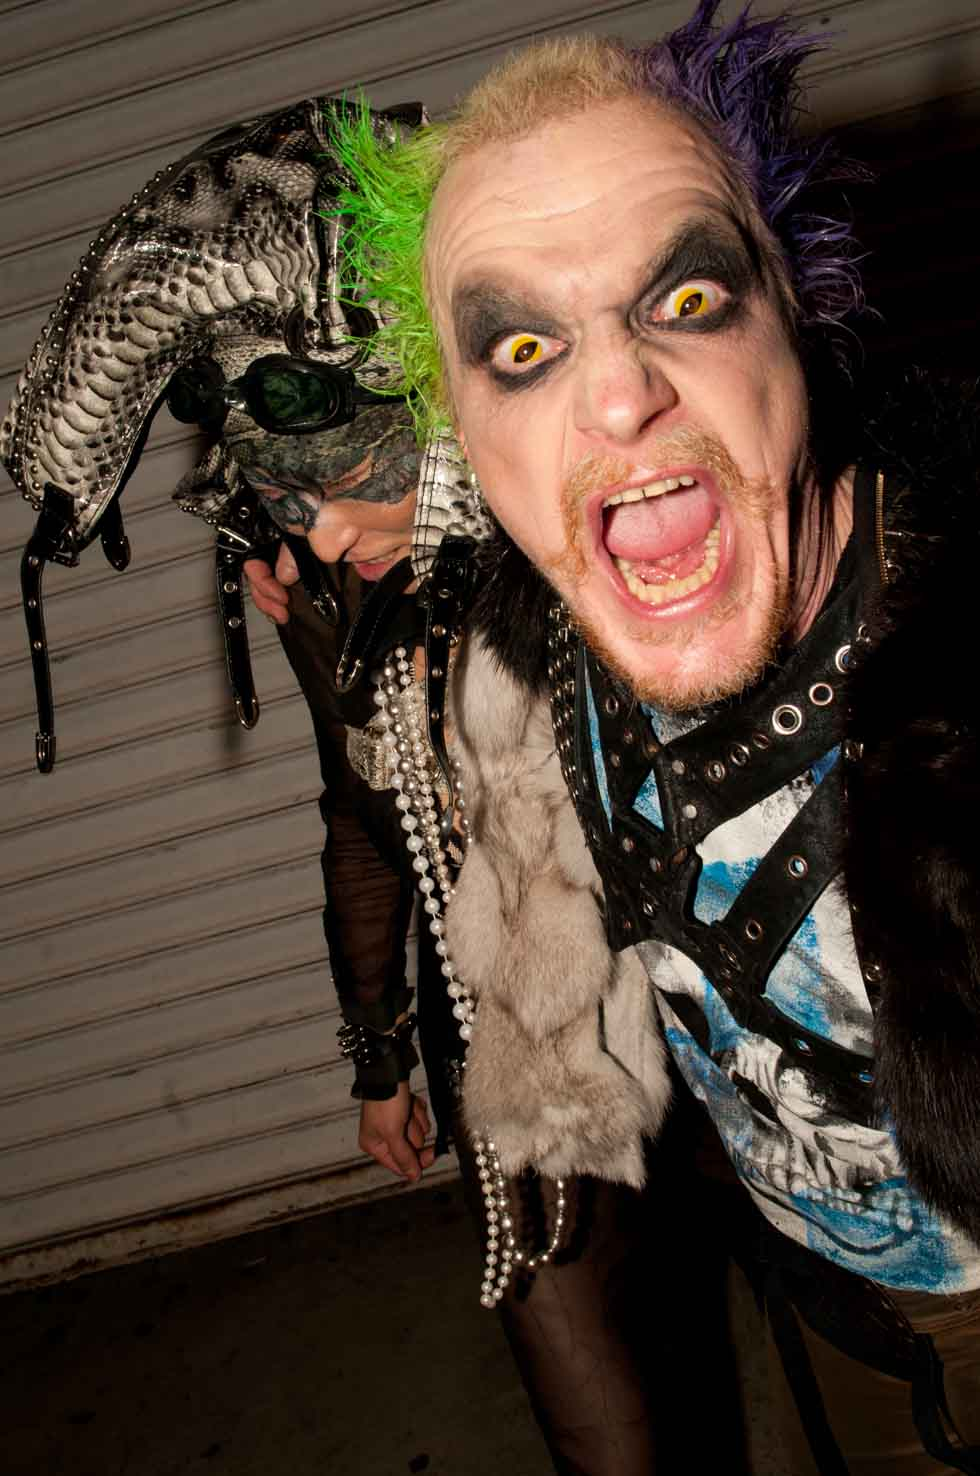 zum-schneider-nyc-2012-karneval-apocalyptika-5465.jpg